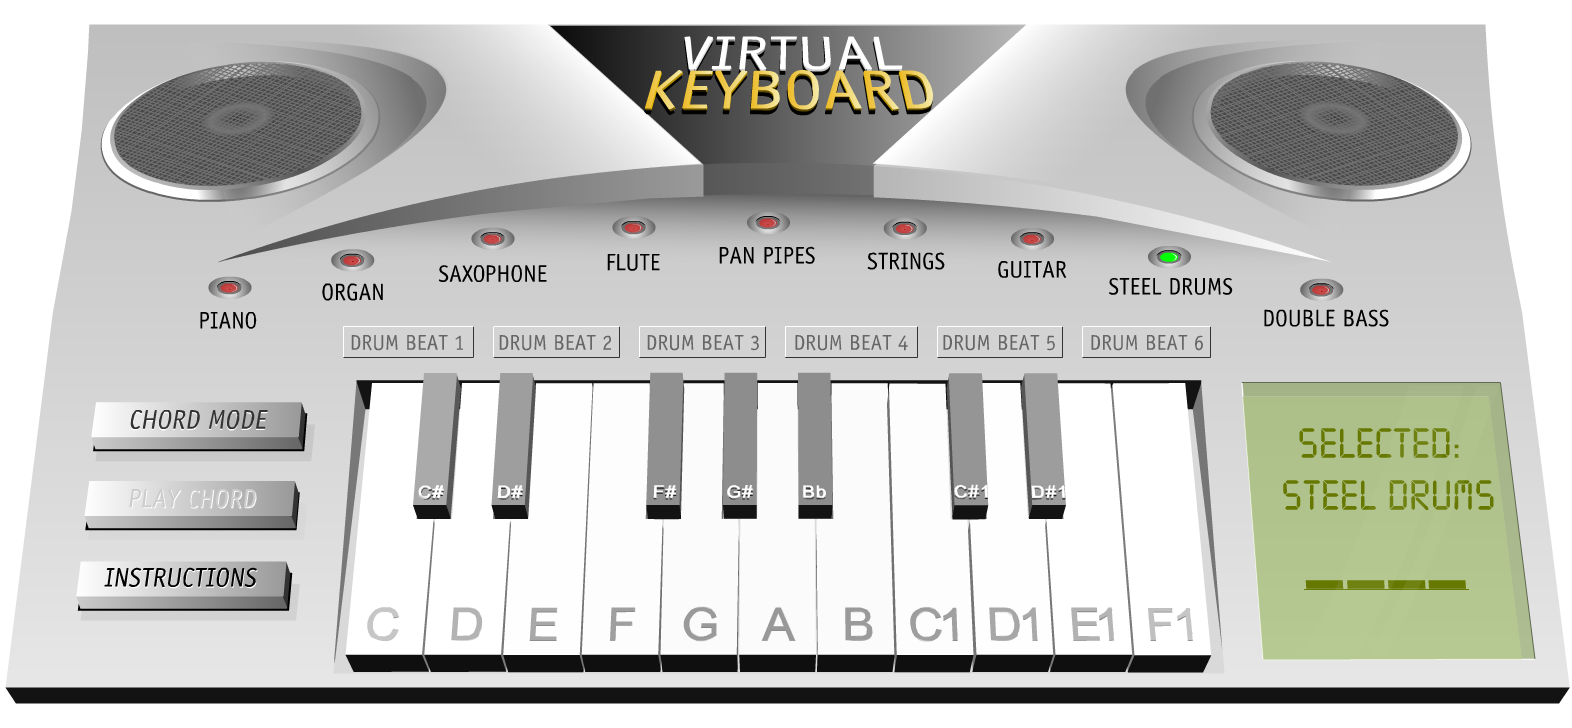 Free Technology for Teachers: Virtual Keyboard - Play Piano, Organ